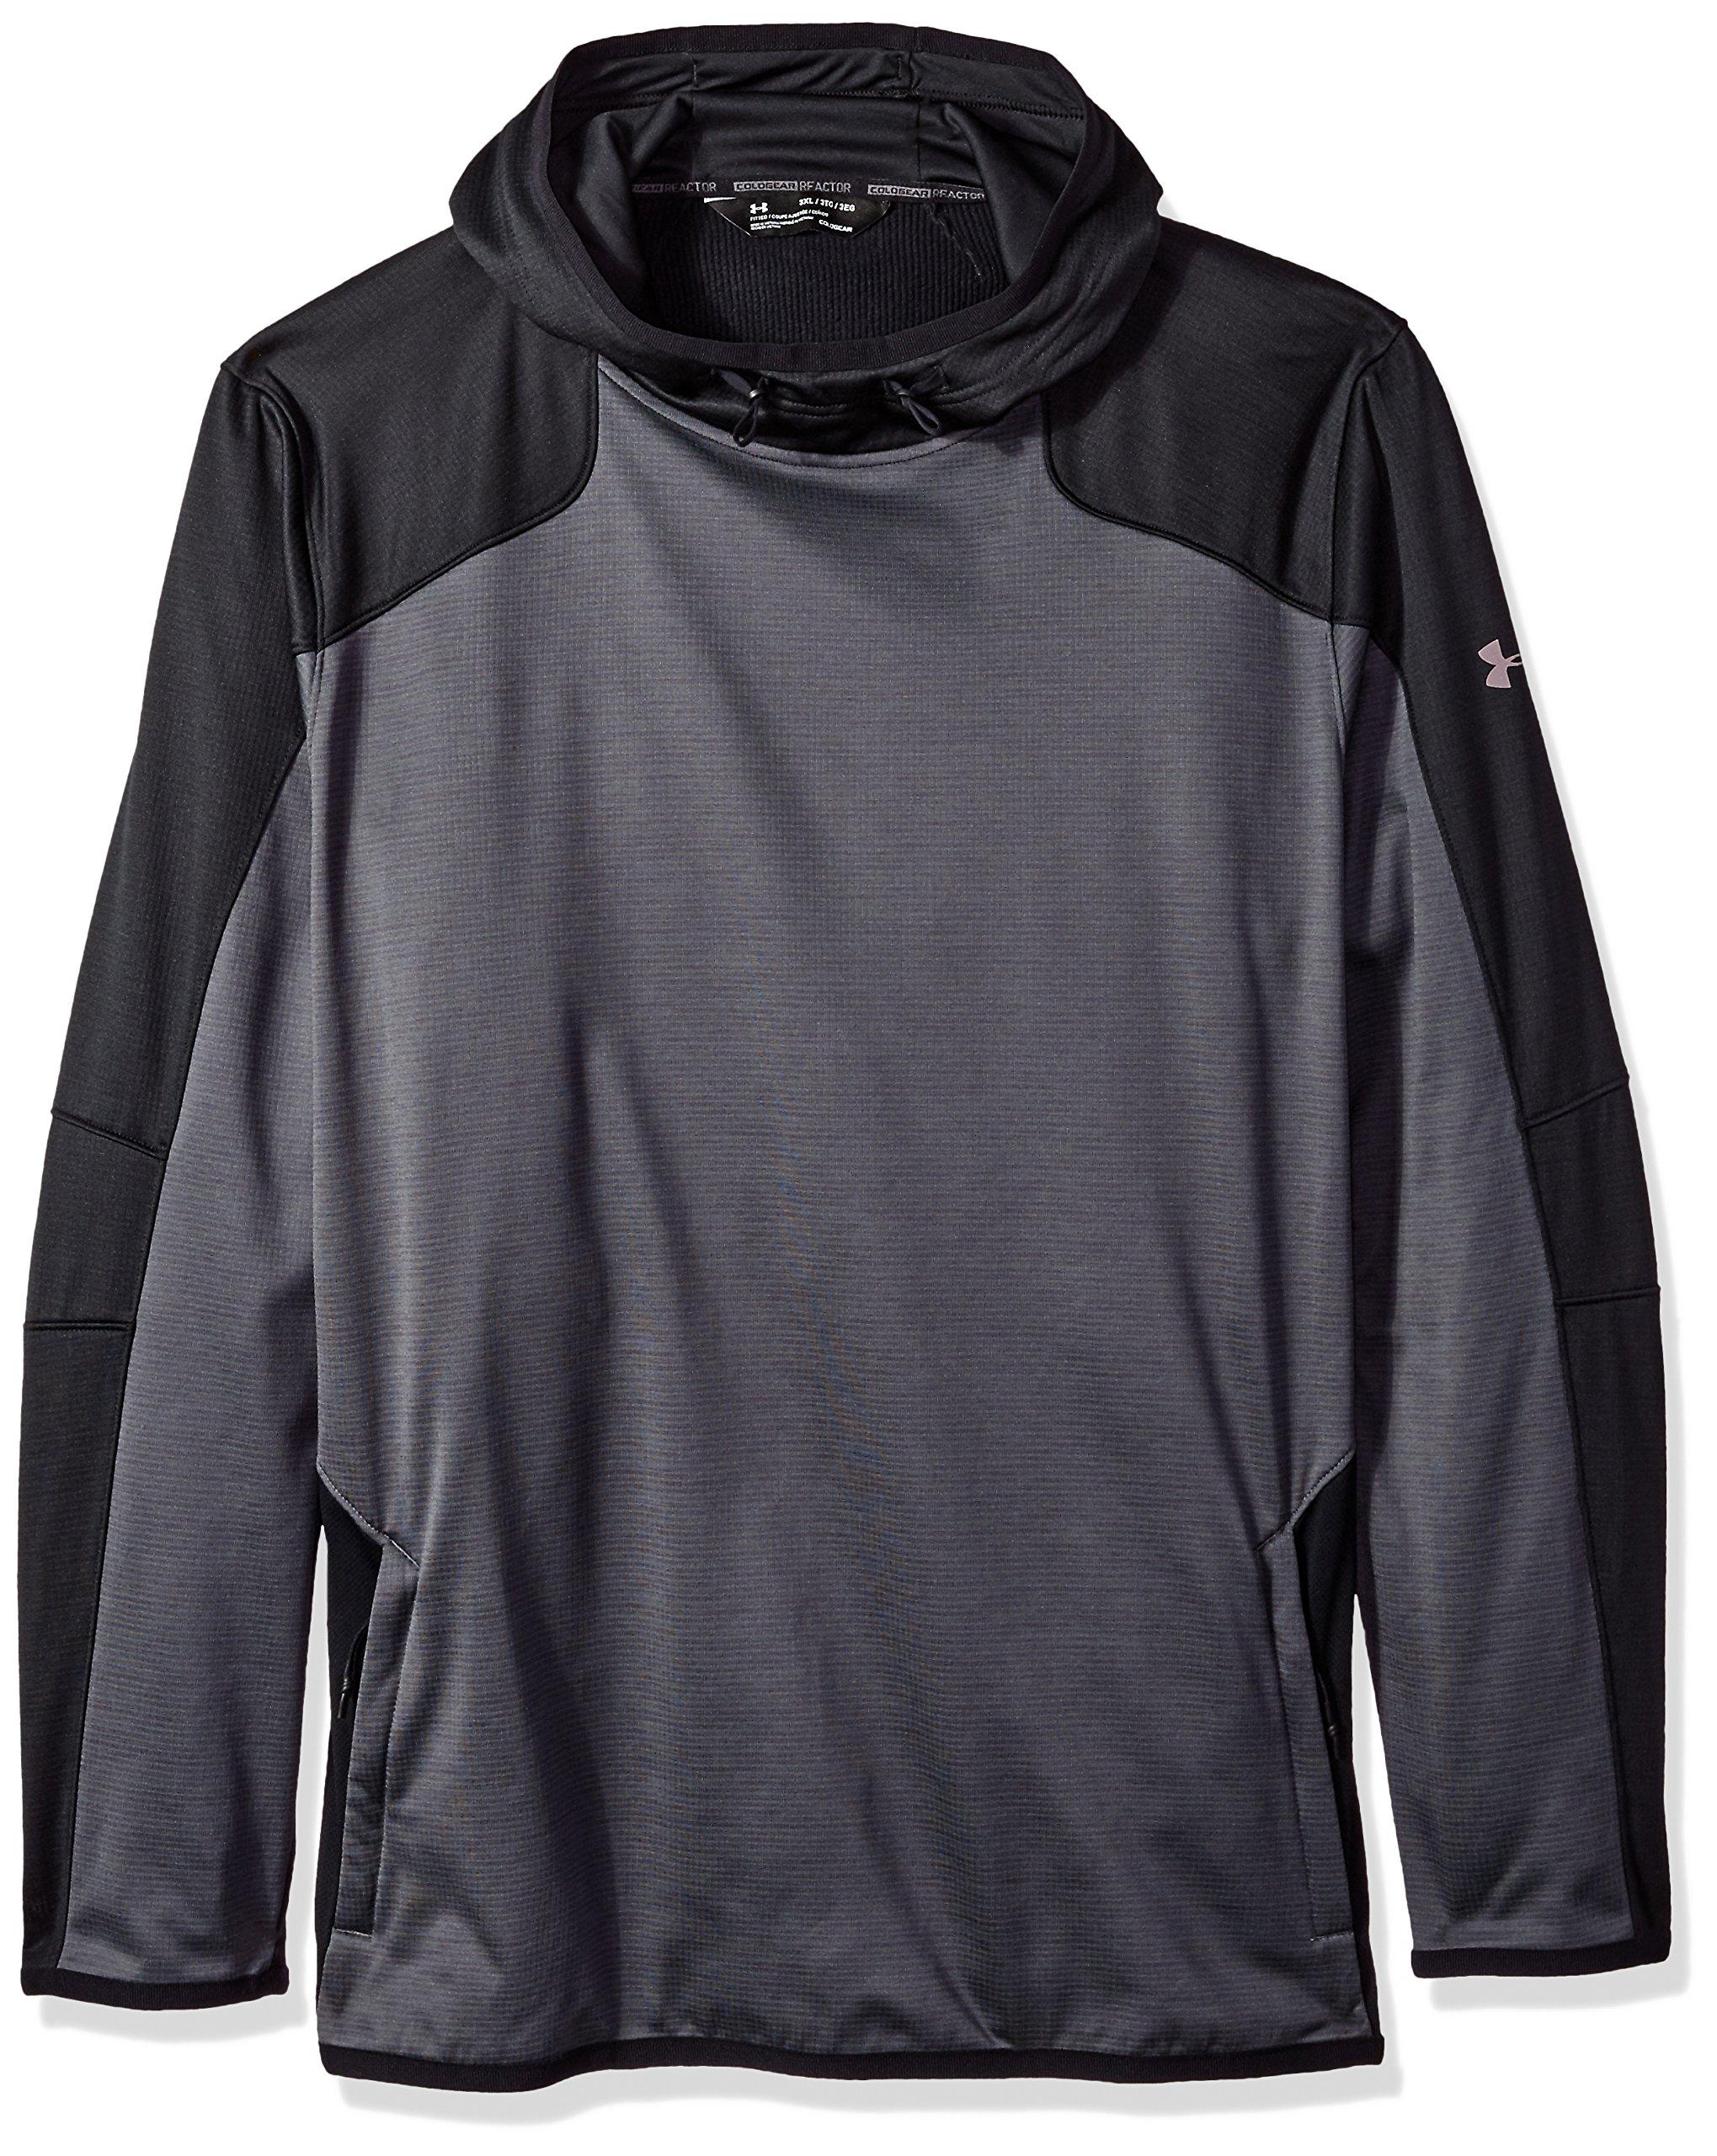 Under Armour Men's Cold Gear Reactor Fleece Hoodie, Rhino Gray (076)/Black, Small